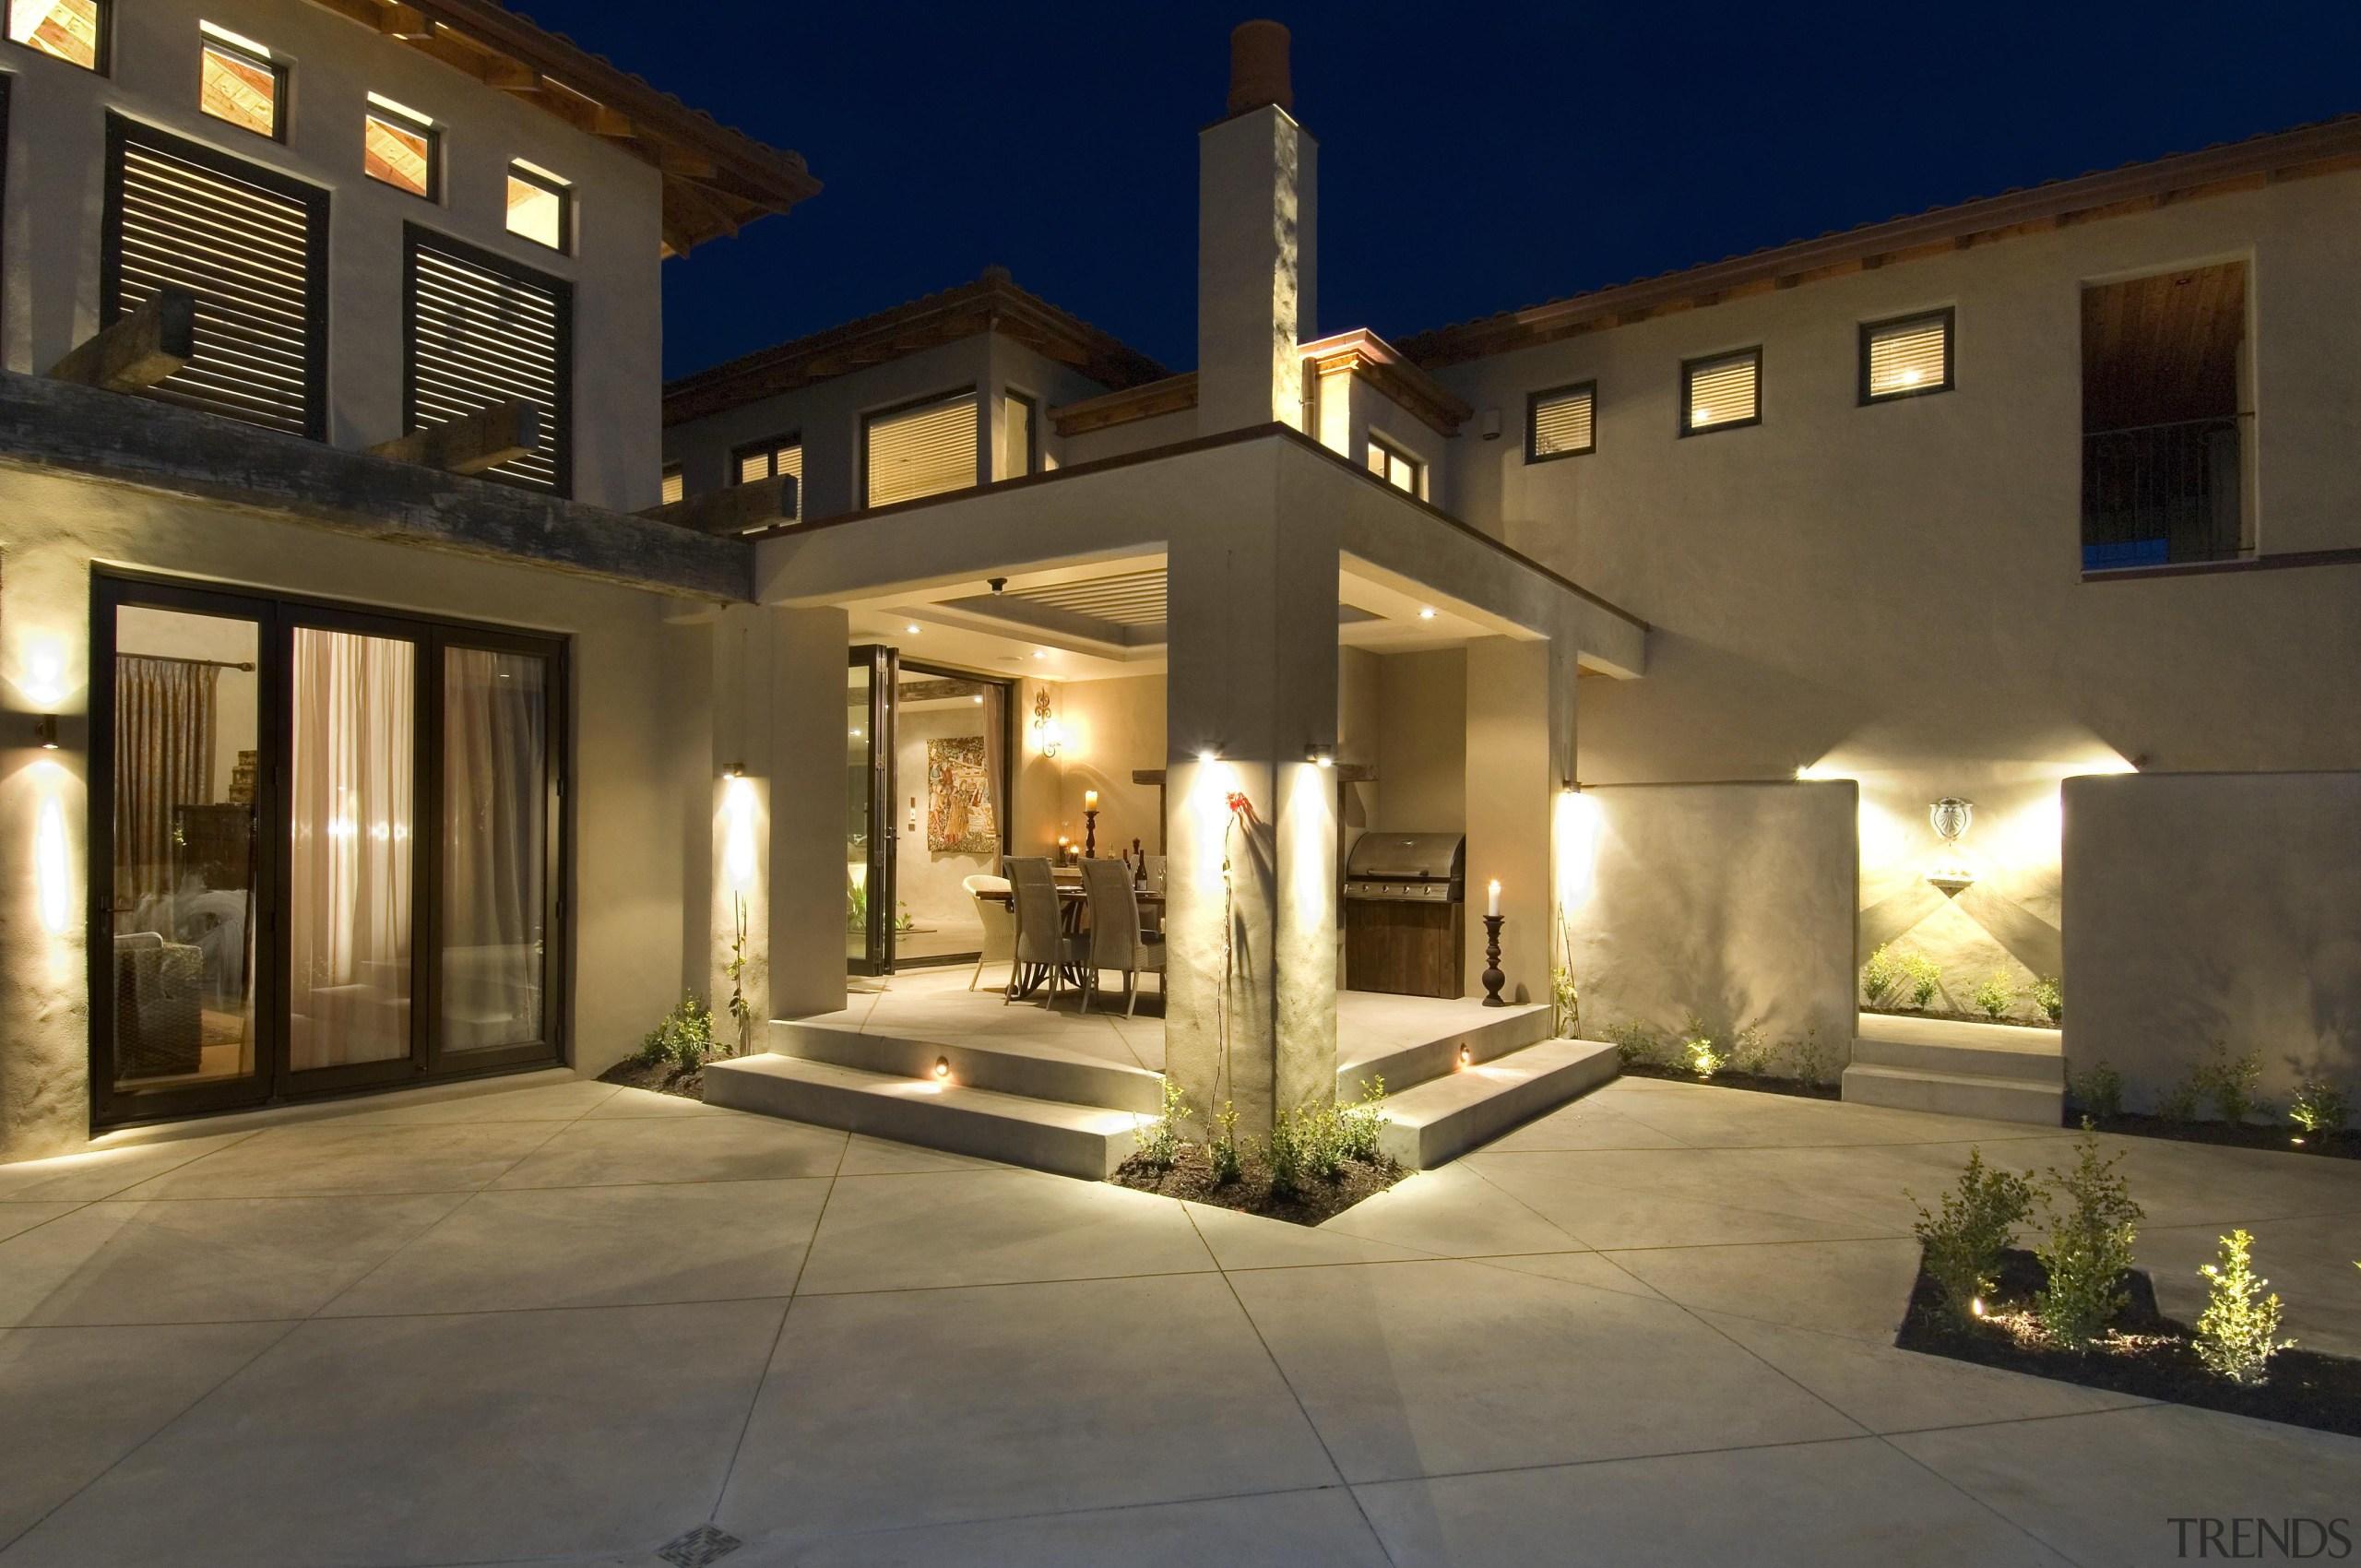 160mangawhai 2 - mangawhai_2 - architecture | building architecture, building, courtyard, estate, facade, home, house, landscape lighting, lighting, property, real estate, villa, brown